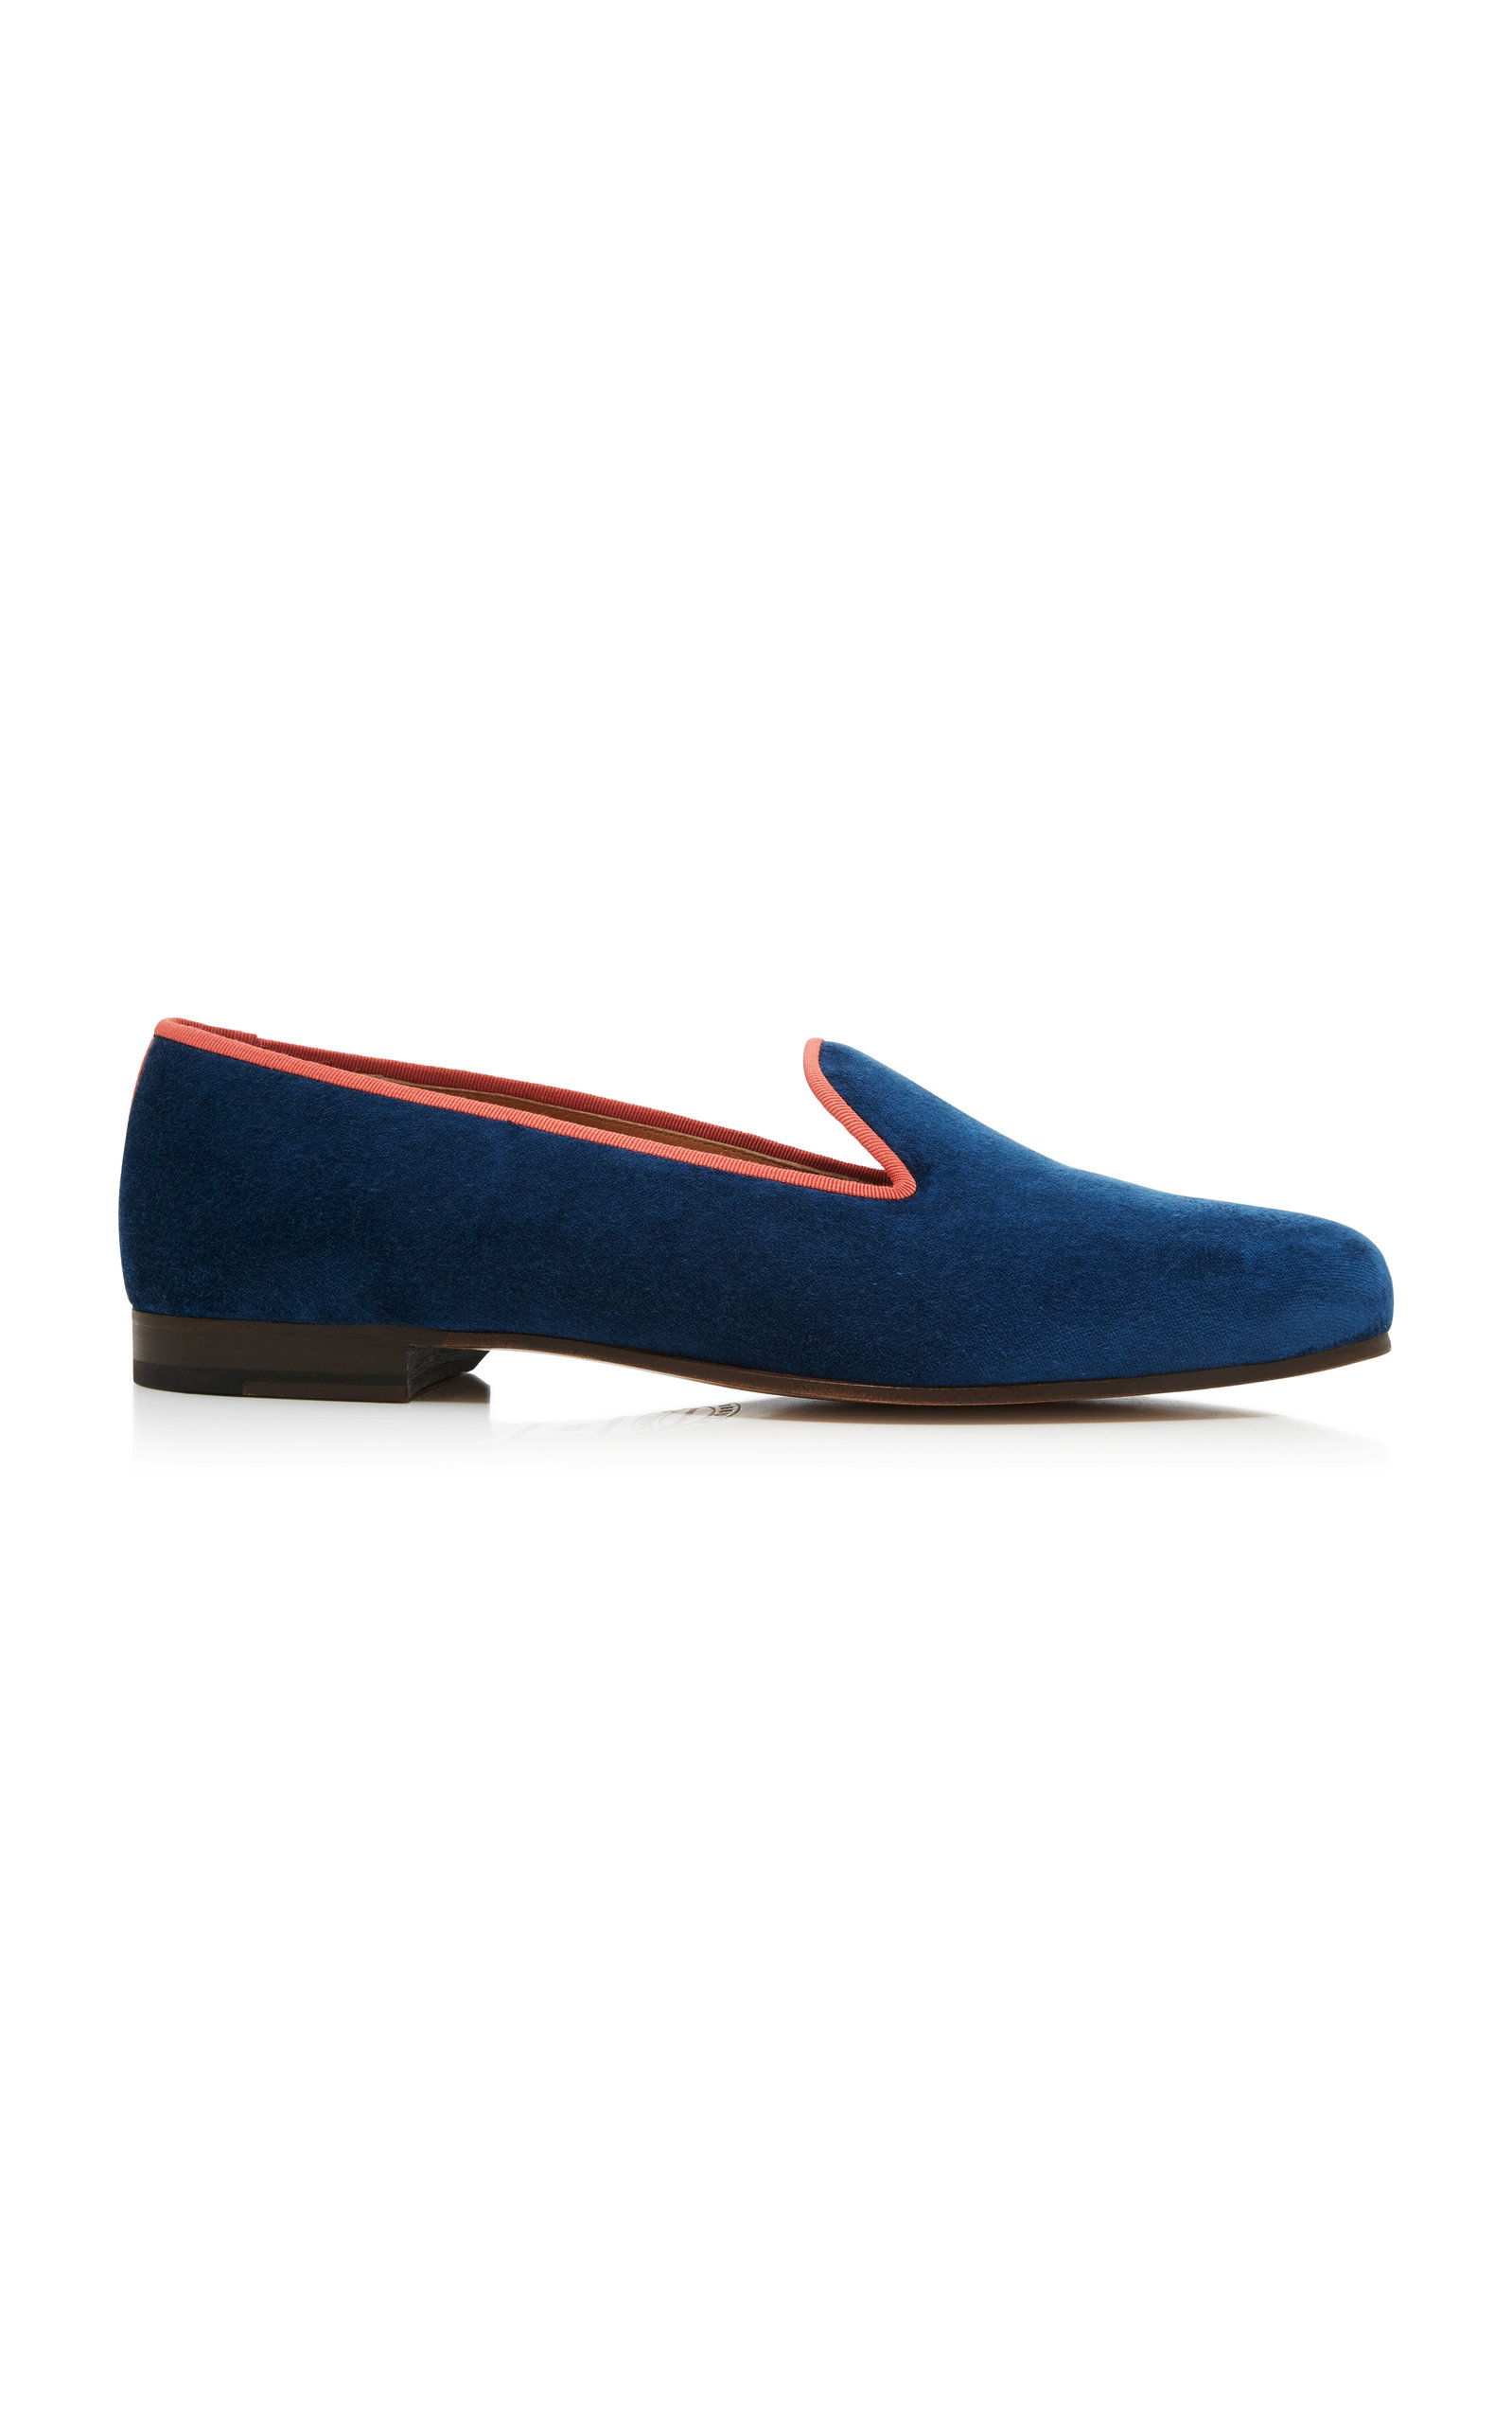 STUBBS & WOOTTON Exclusive Kingfisher Velvet Slippers in Blue